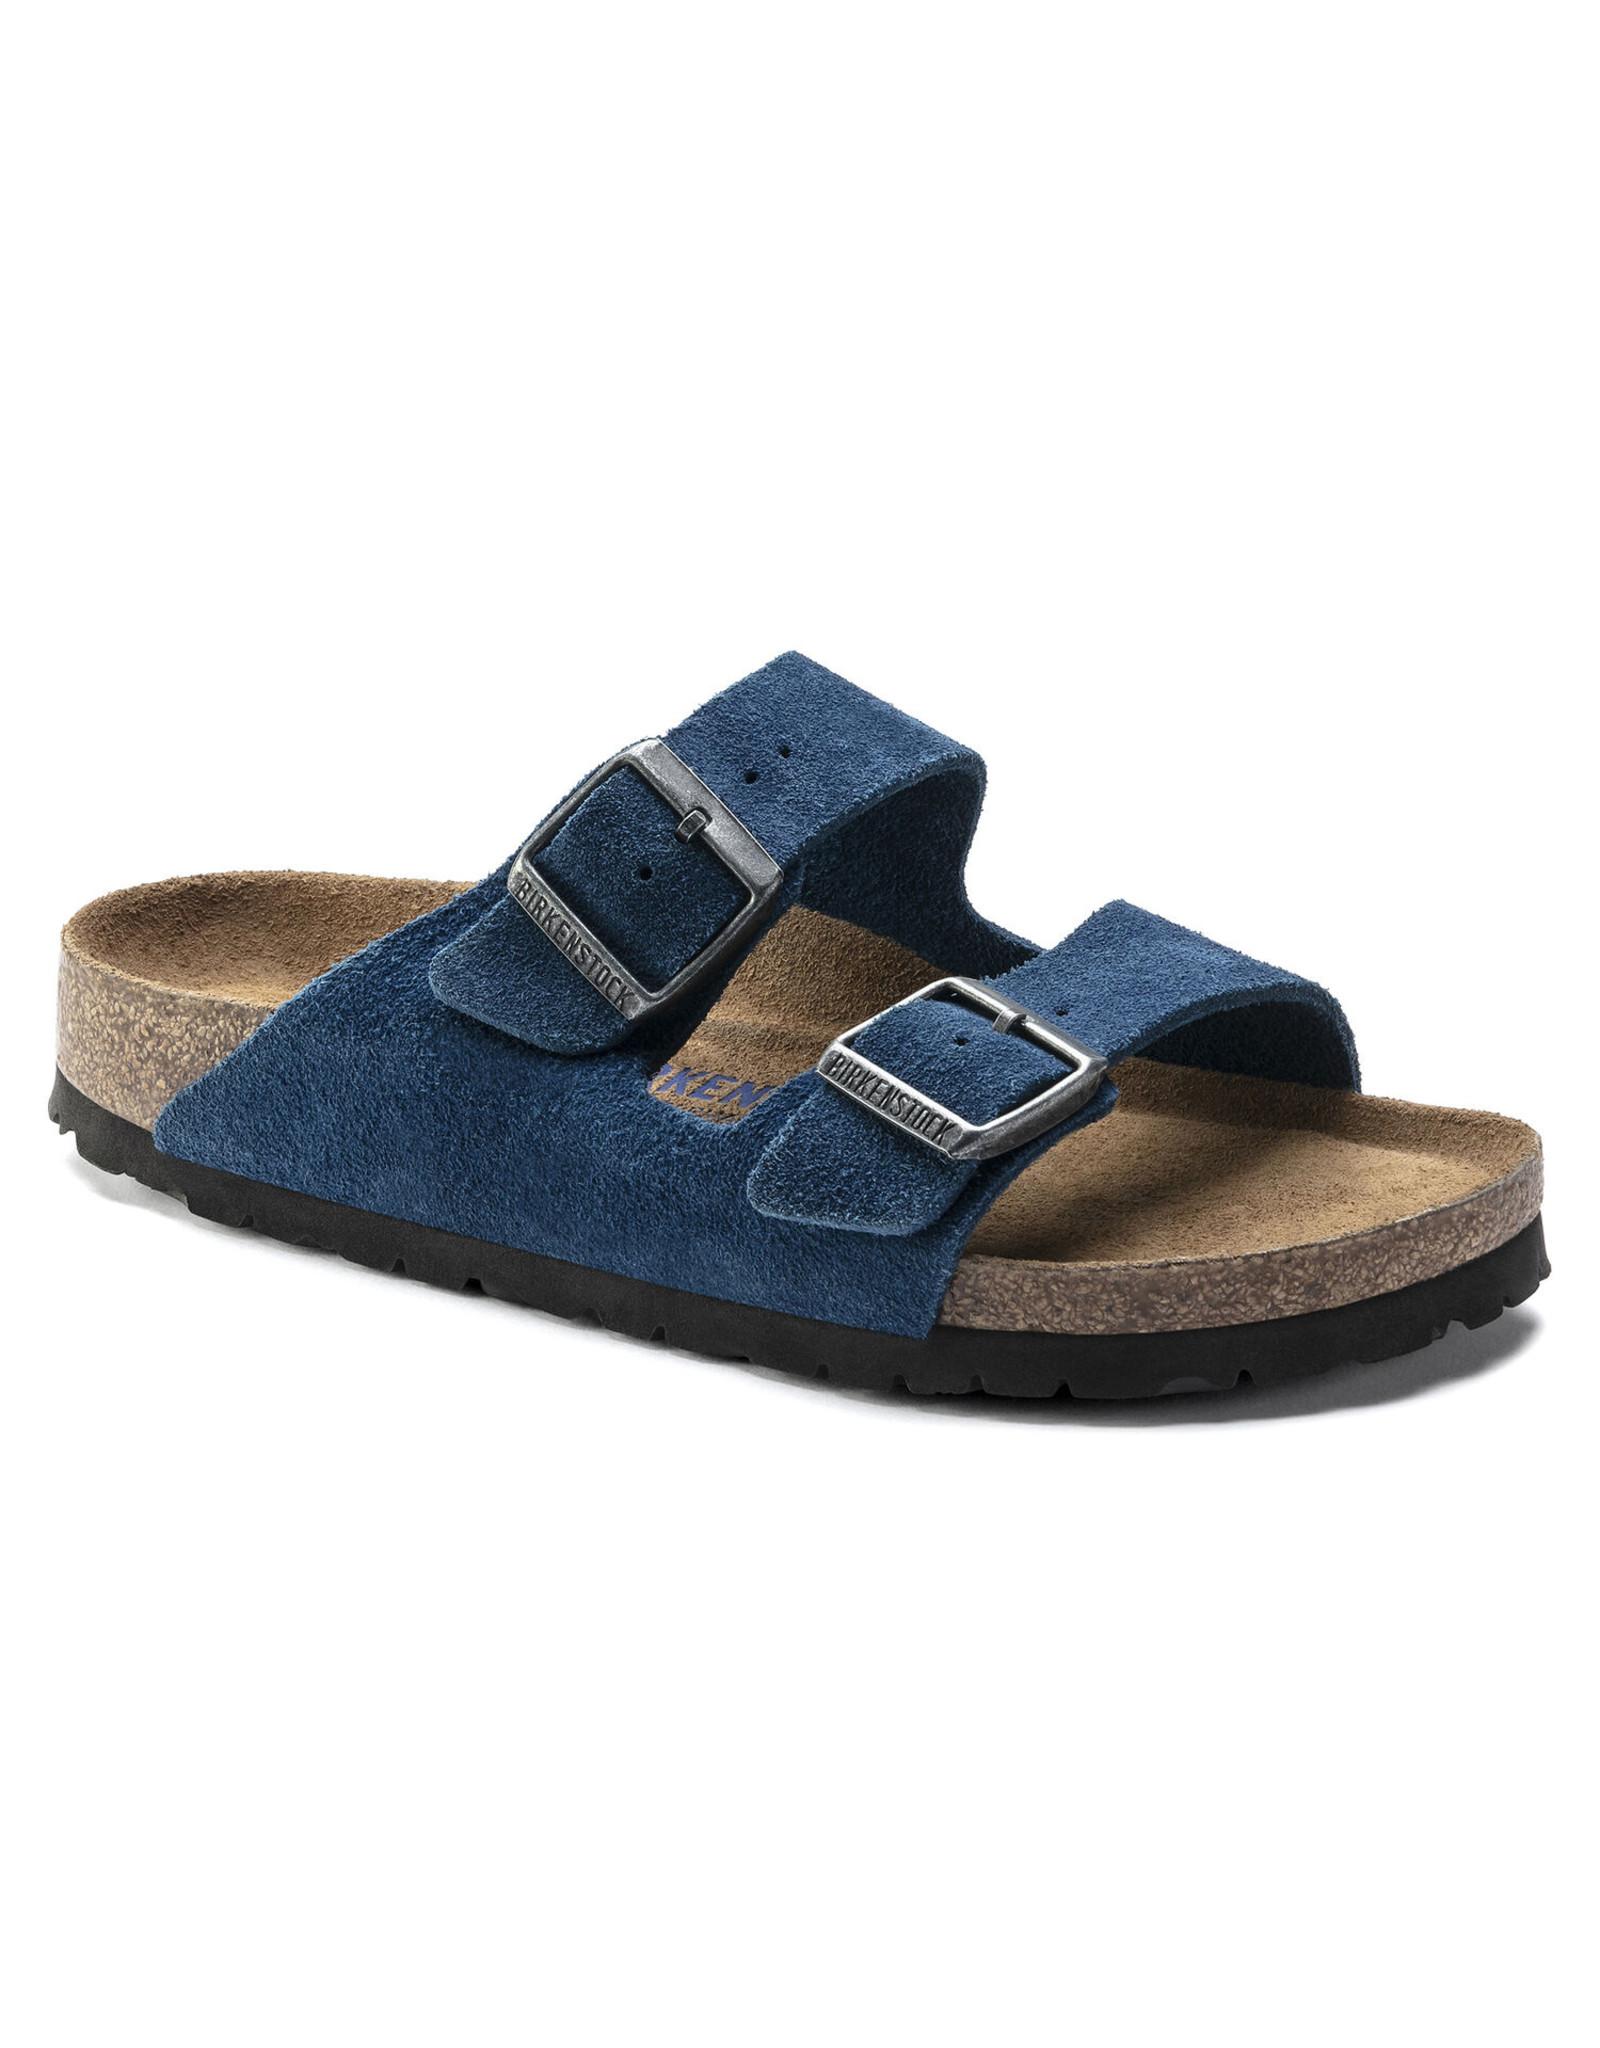 BIRKENSTOCK ARIZONA SOFT FOOTBED SUEDE LEATHER-MOROCCAN BLUE